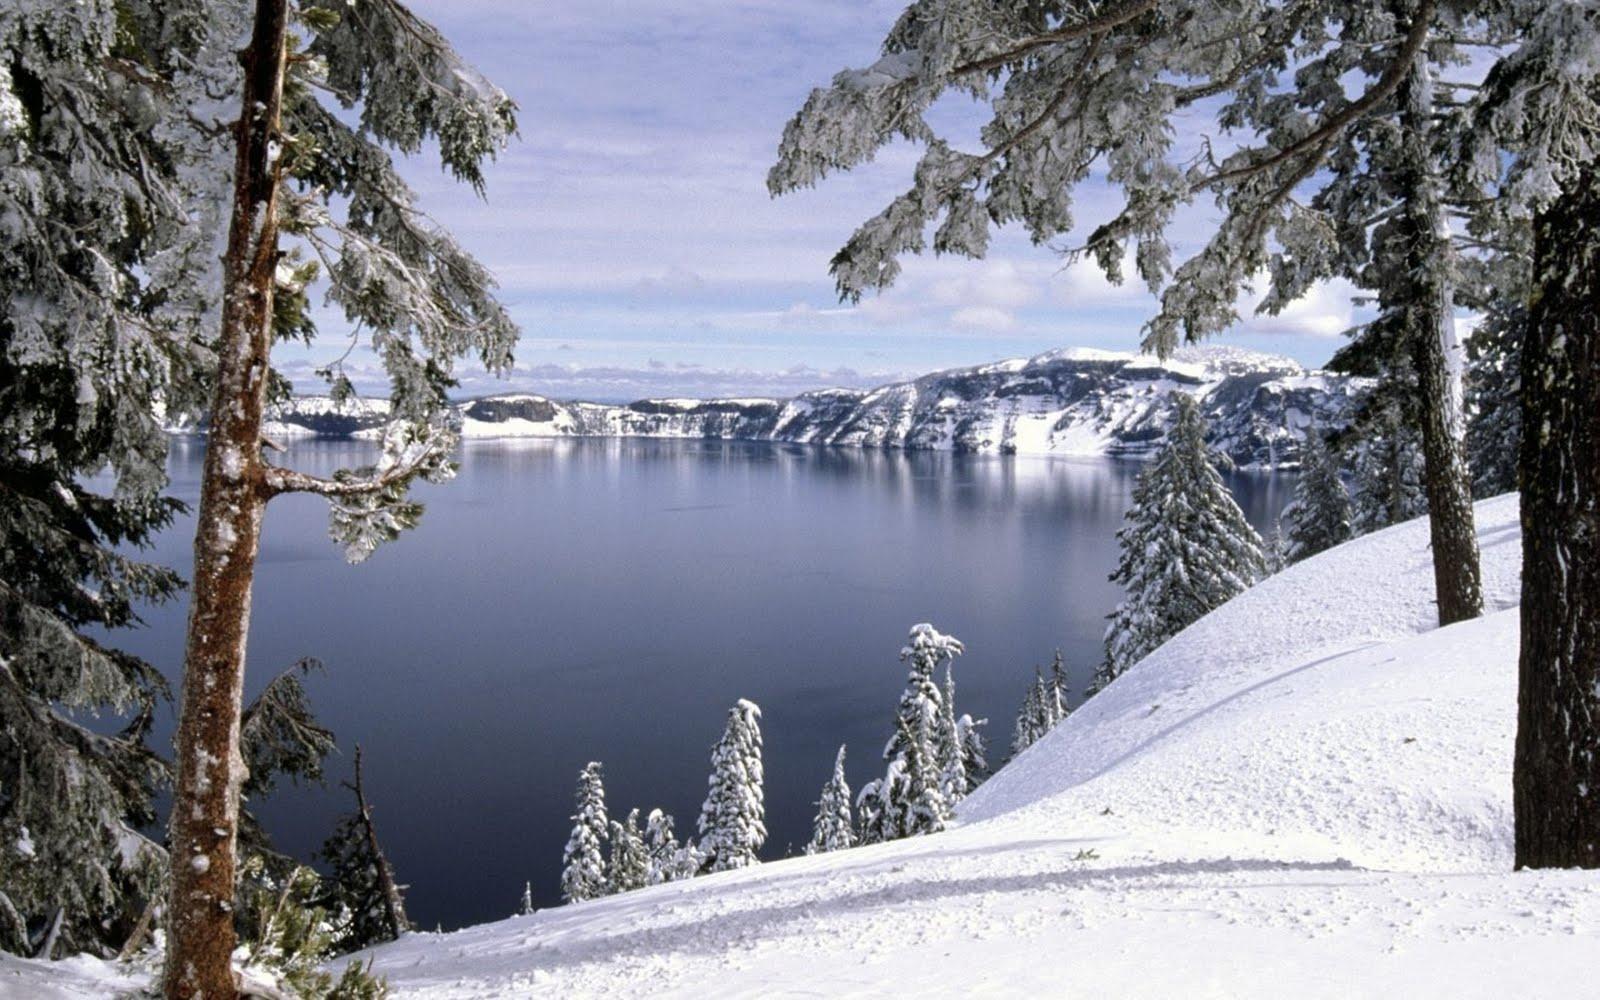 scenic winter beautiful wallpapers - photo #35